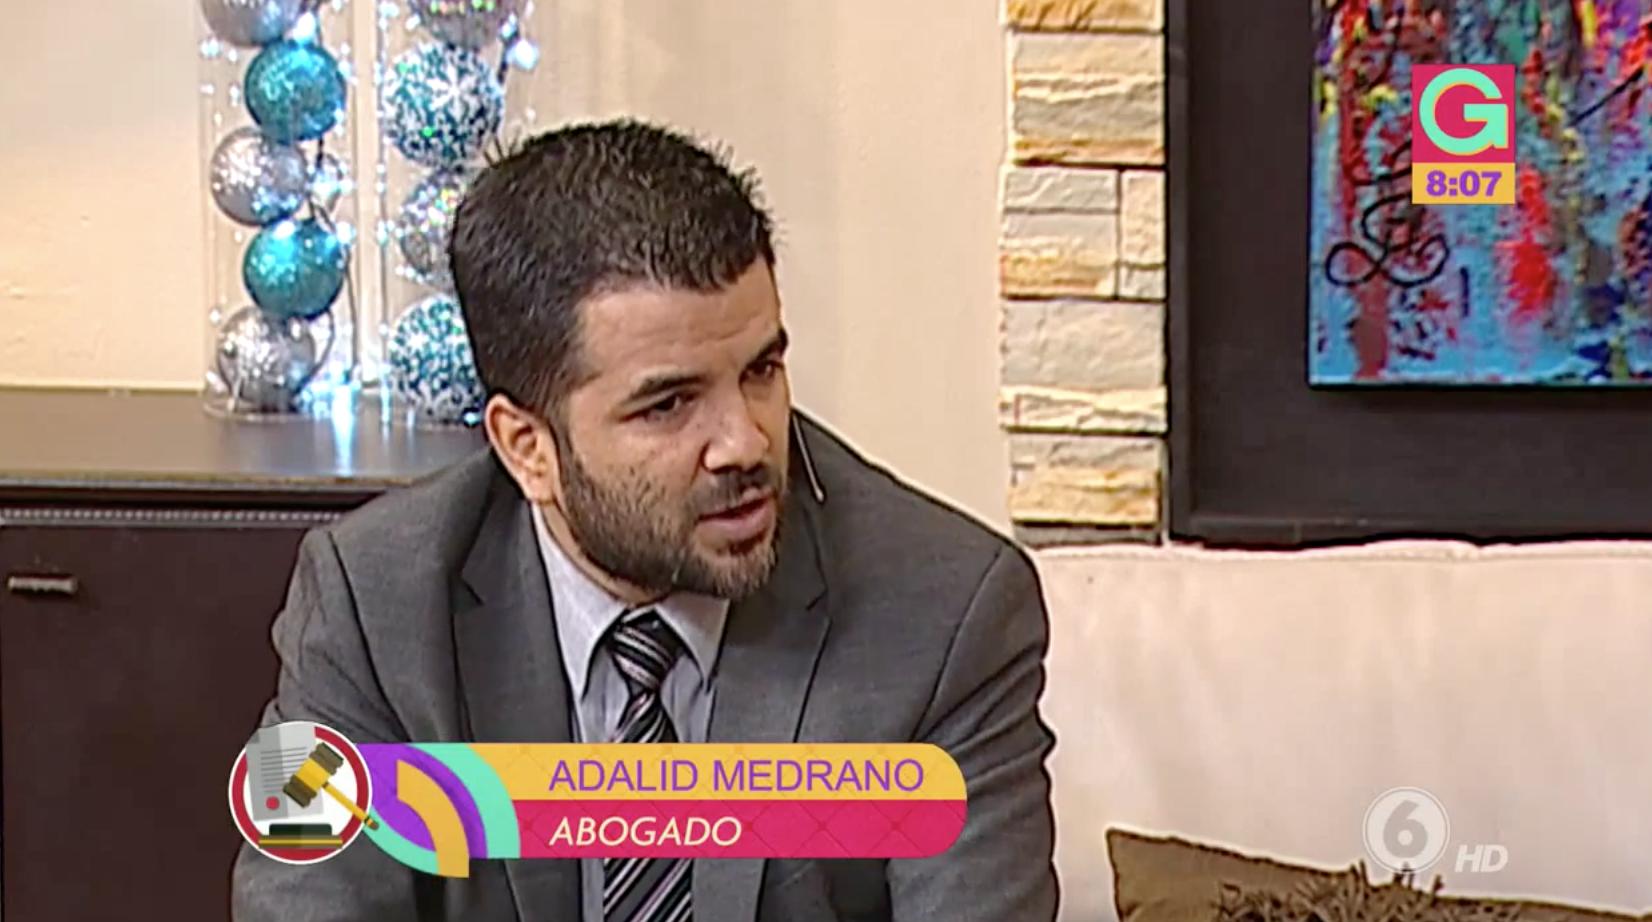 https://adalidmedrano.com/wp-content/uploads/2018/06/entrevista-giros.png